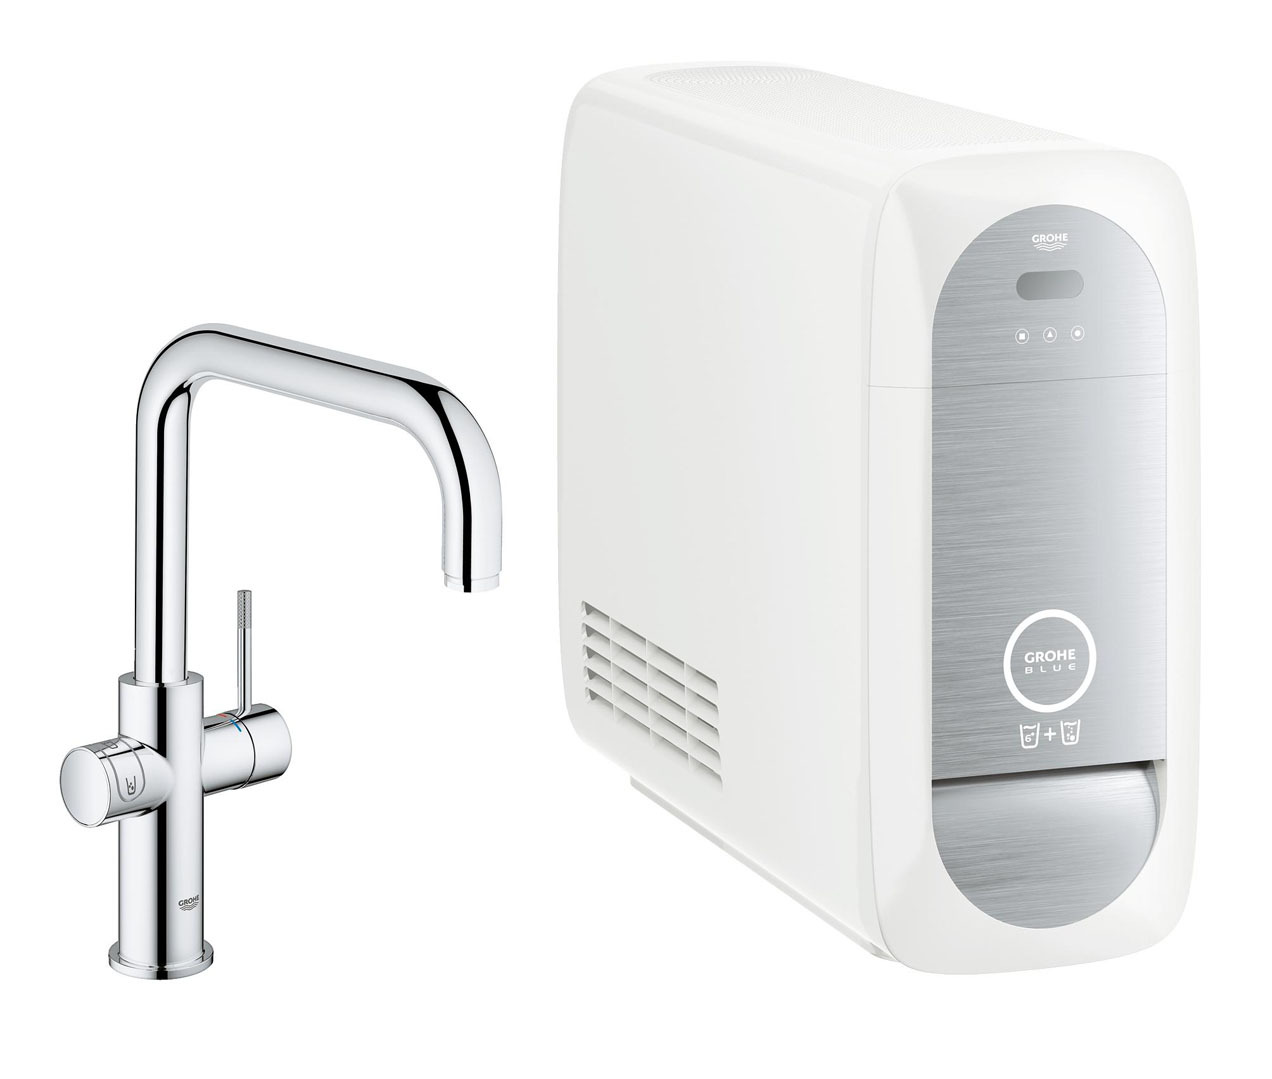 grohe blue home 31456000 kitchen faucet. Black Bedroom Furniture Sets. Home Design Ideas